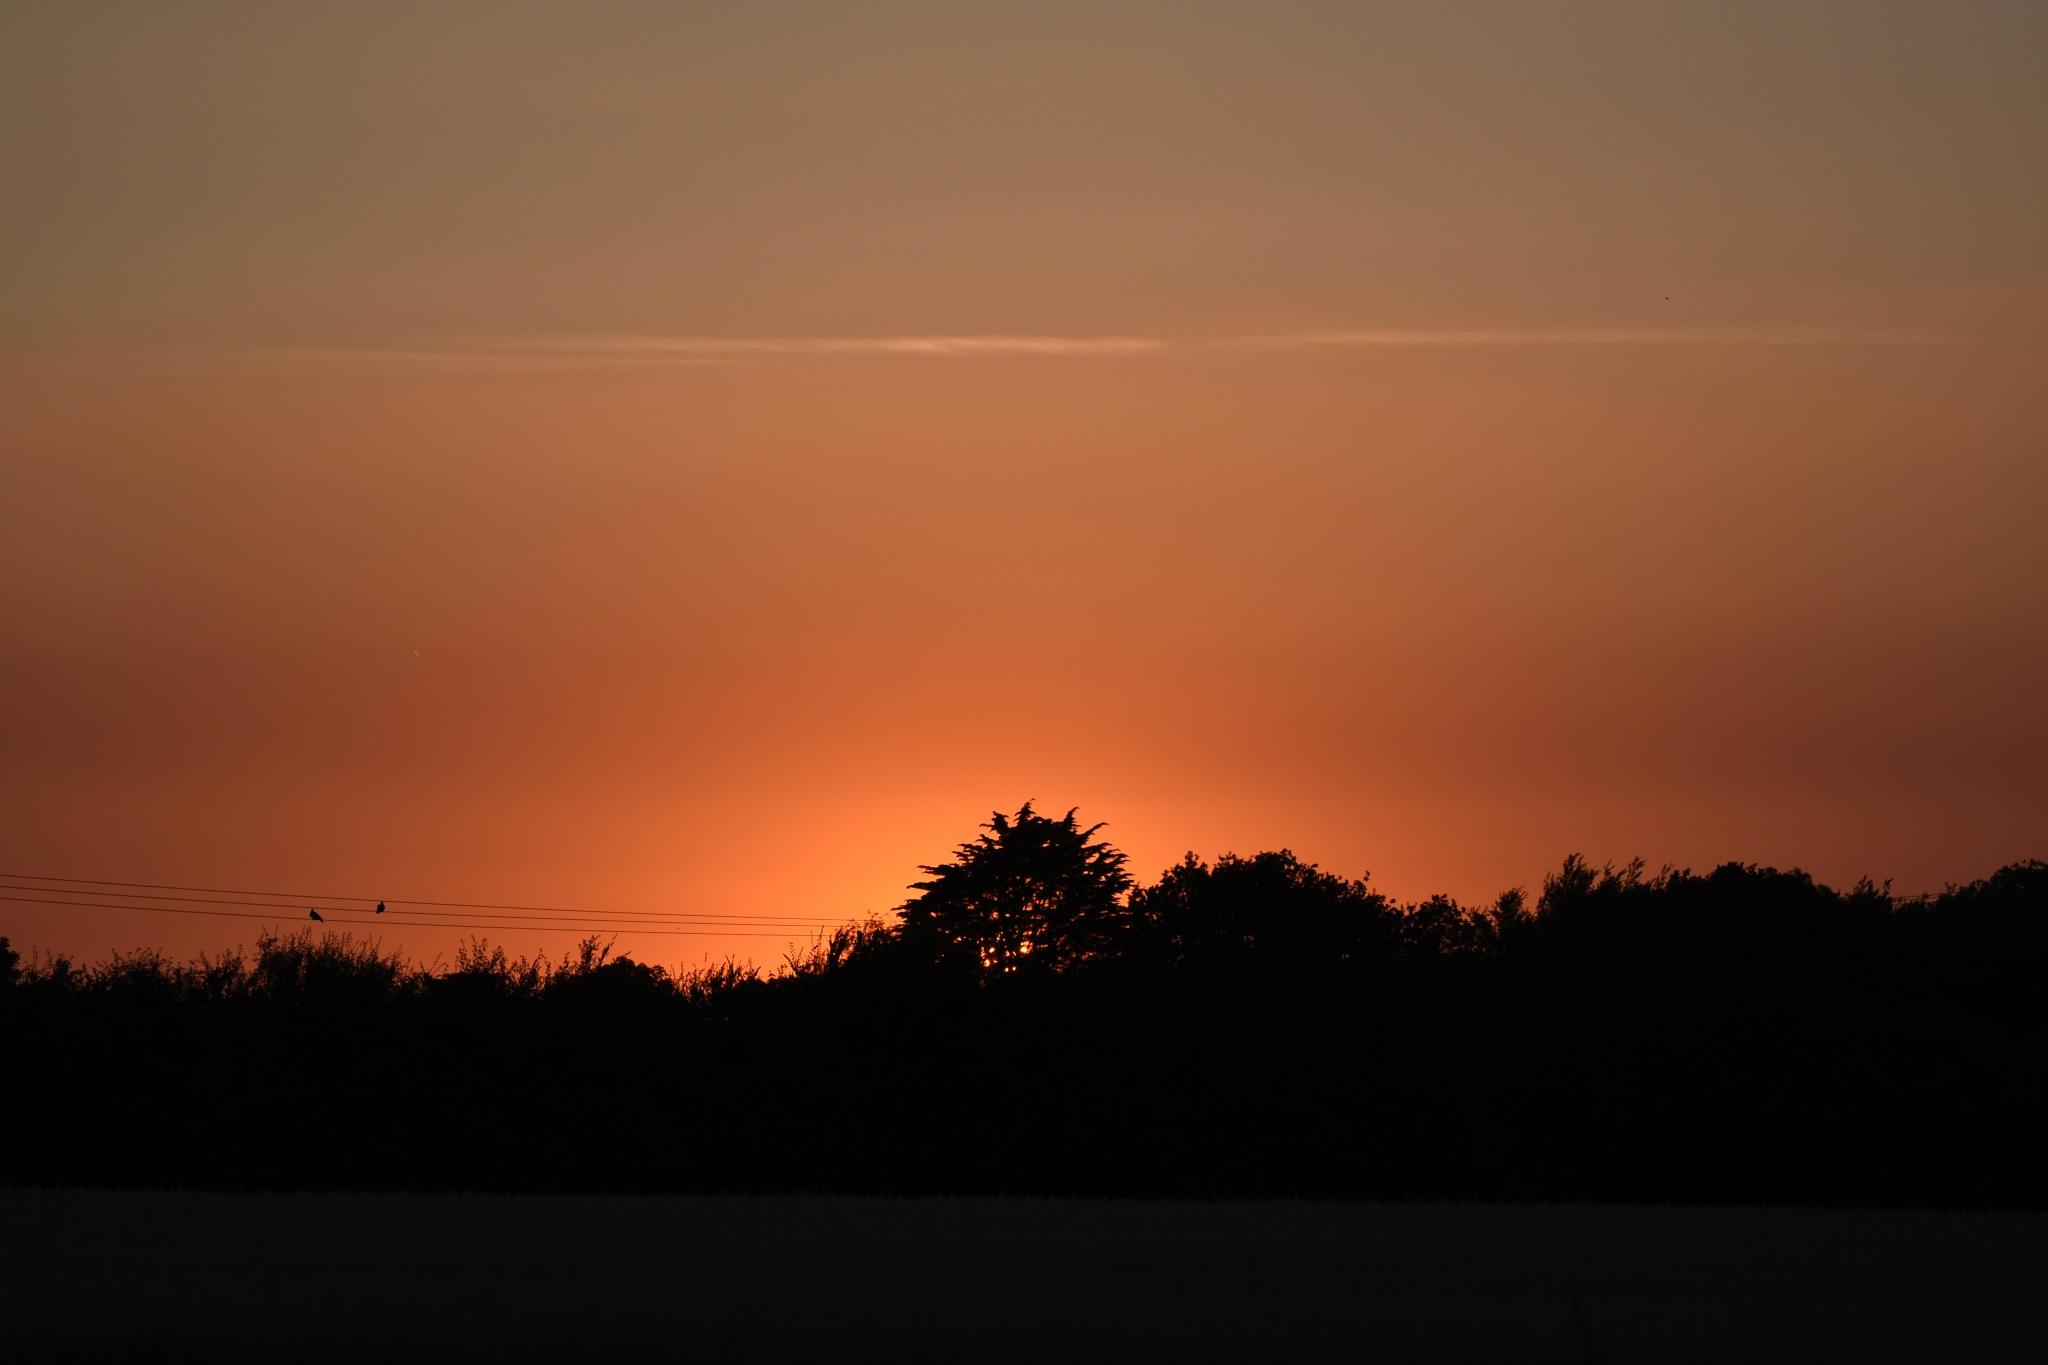 sunset by zetec09